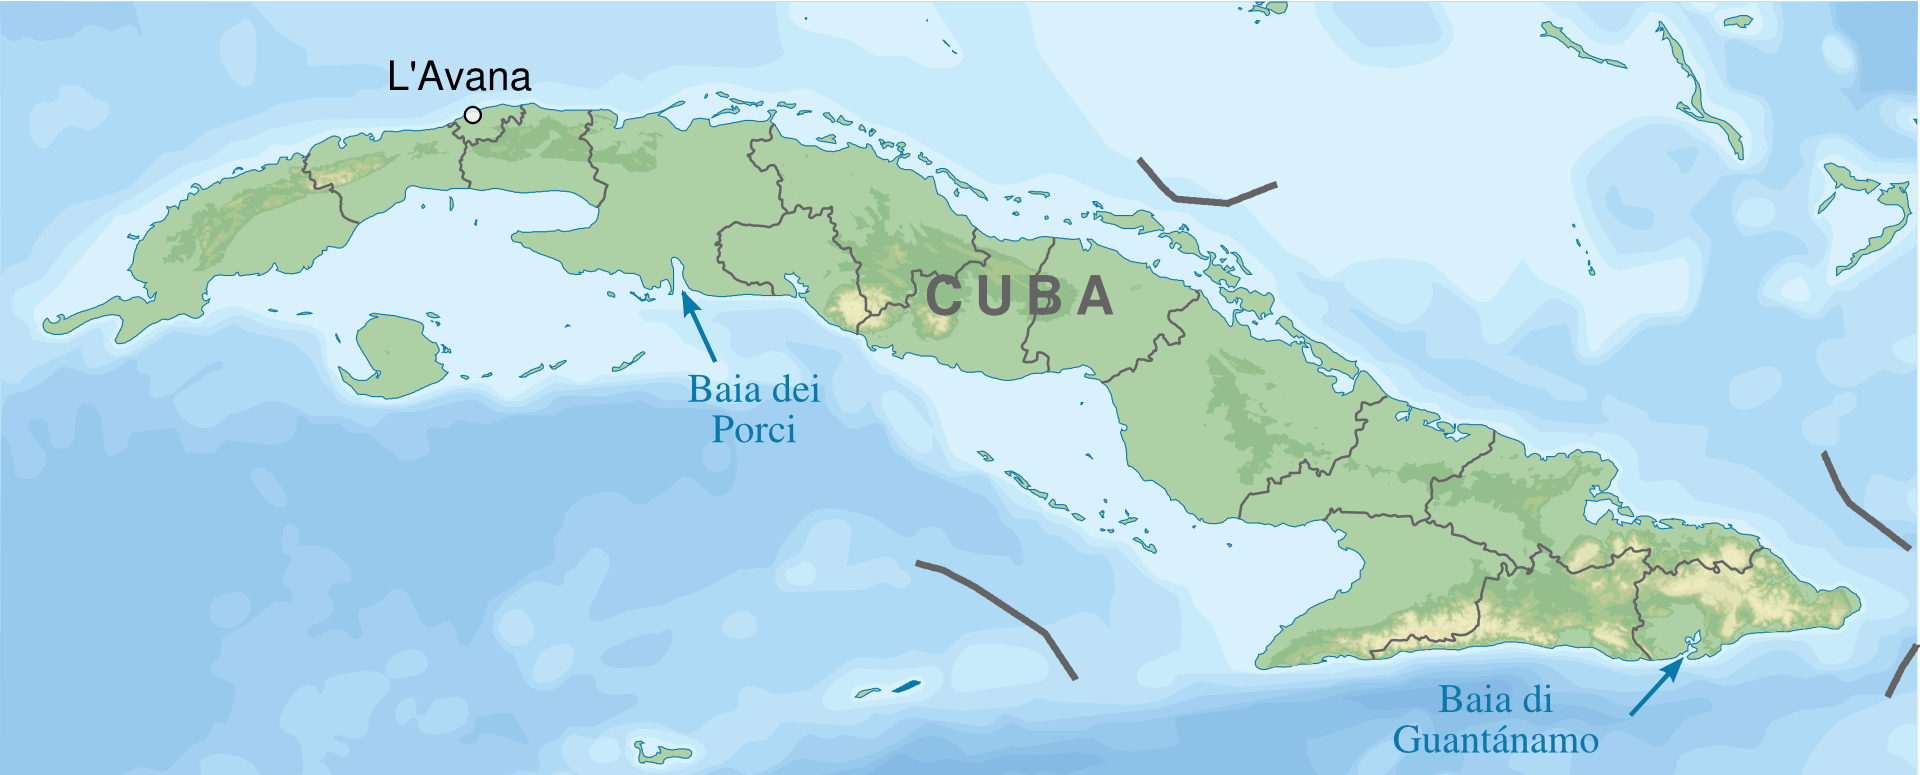 Karte Kuba Varadero.Karte Kuba Casa Particular Verzeichnis